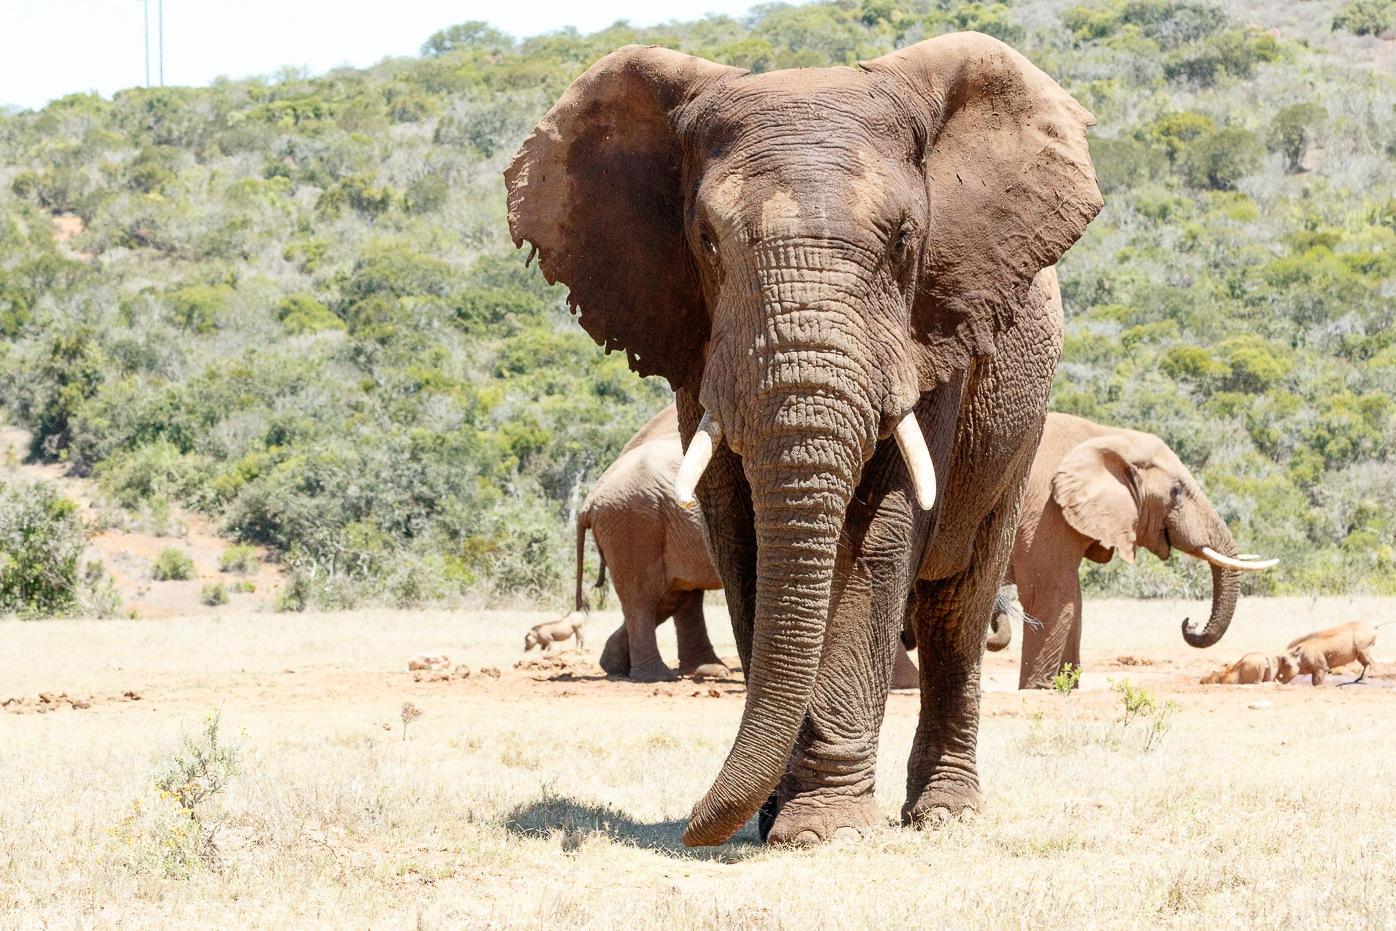 African Elephant standing tall  by Mark de Scande